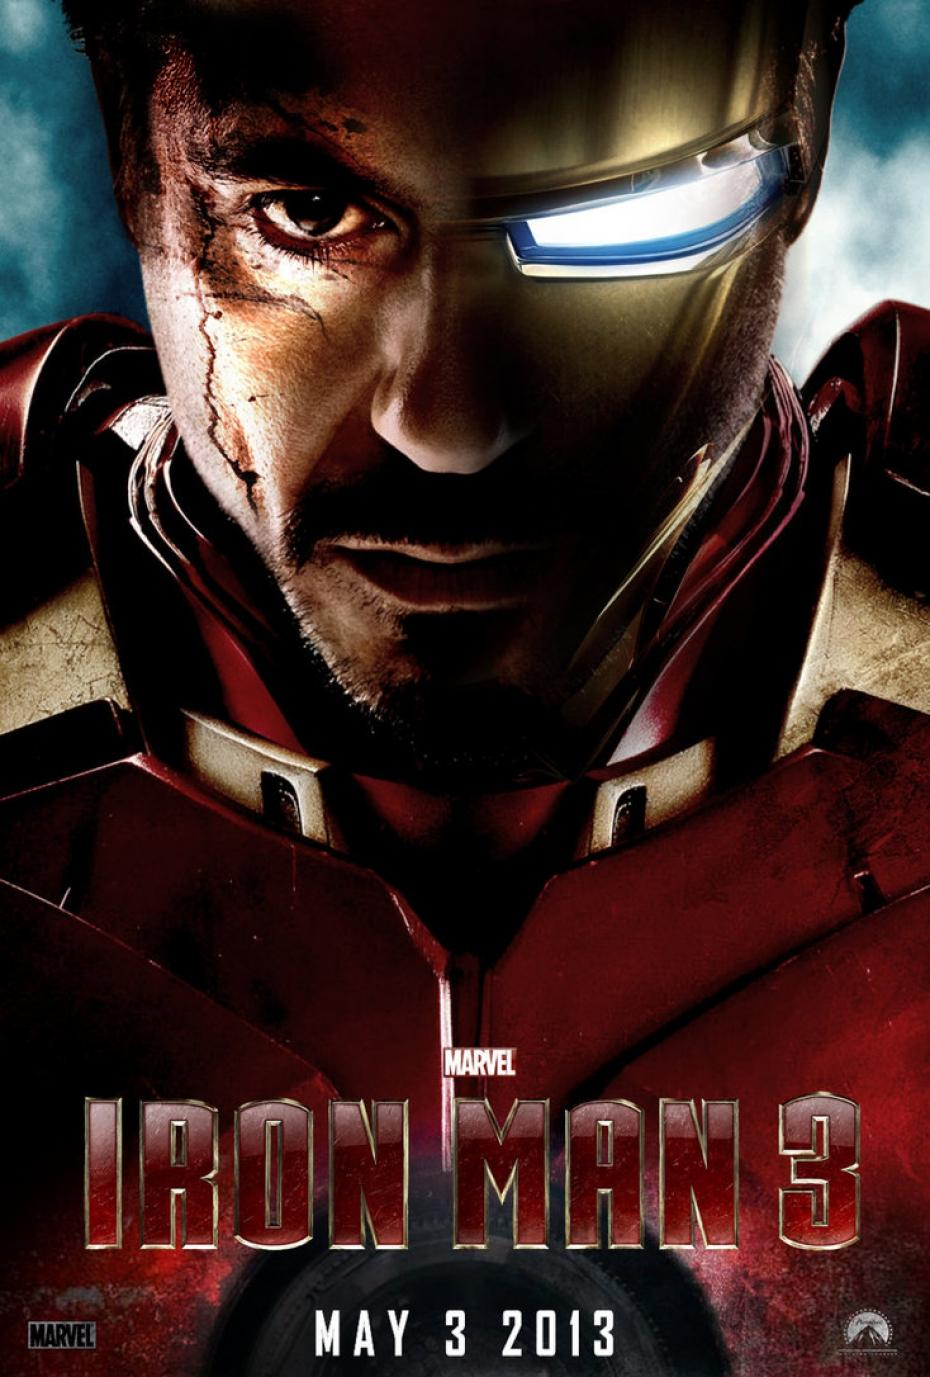 Wallpaper Affiche Iron Man 3 portrait Iron Man